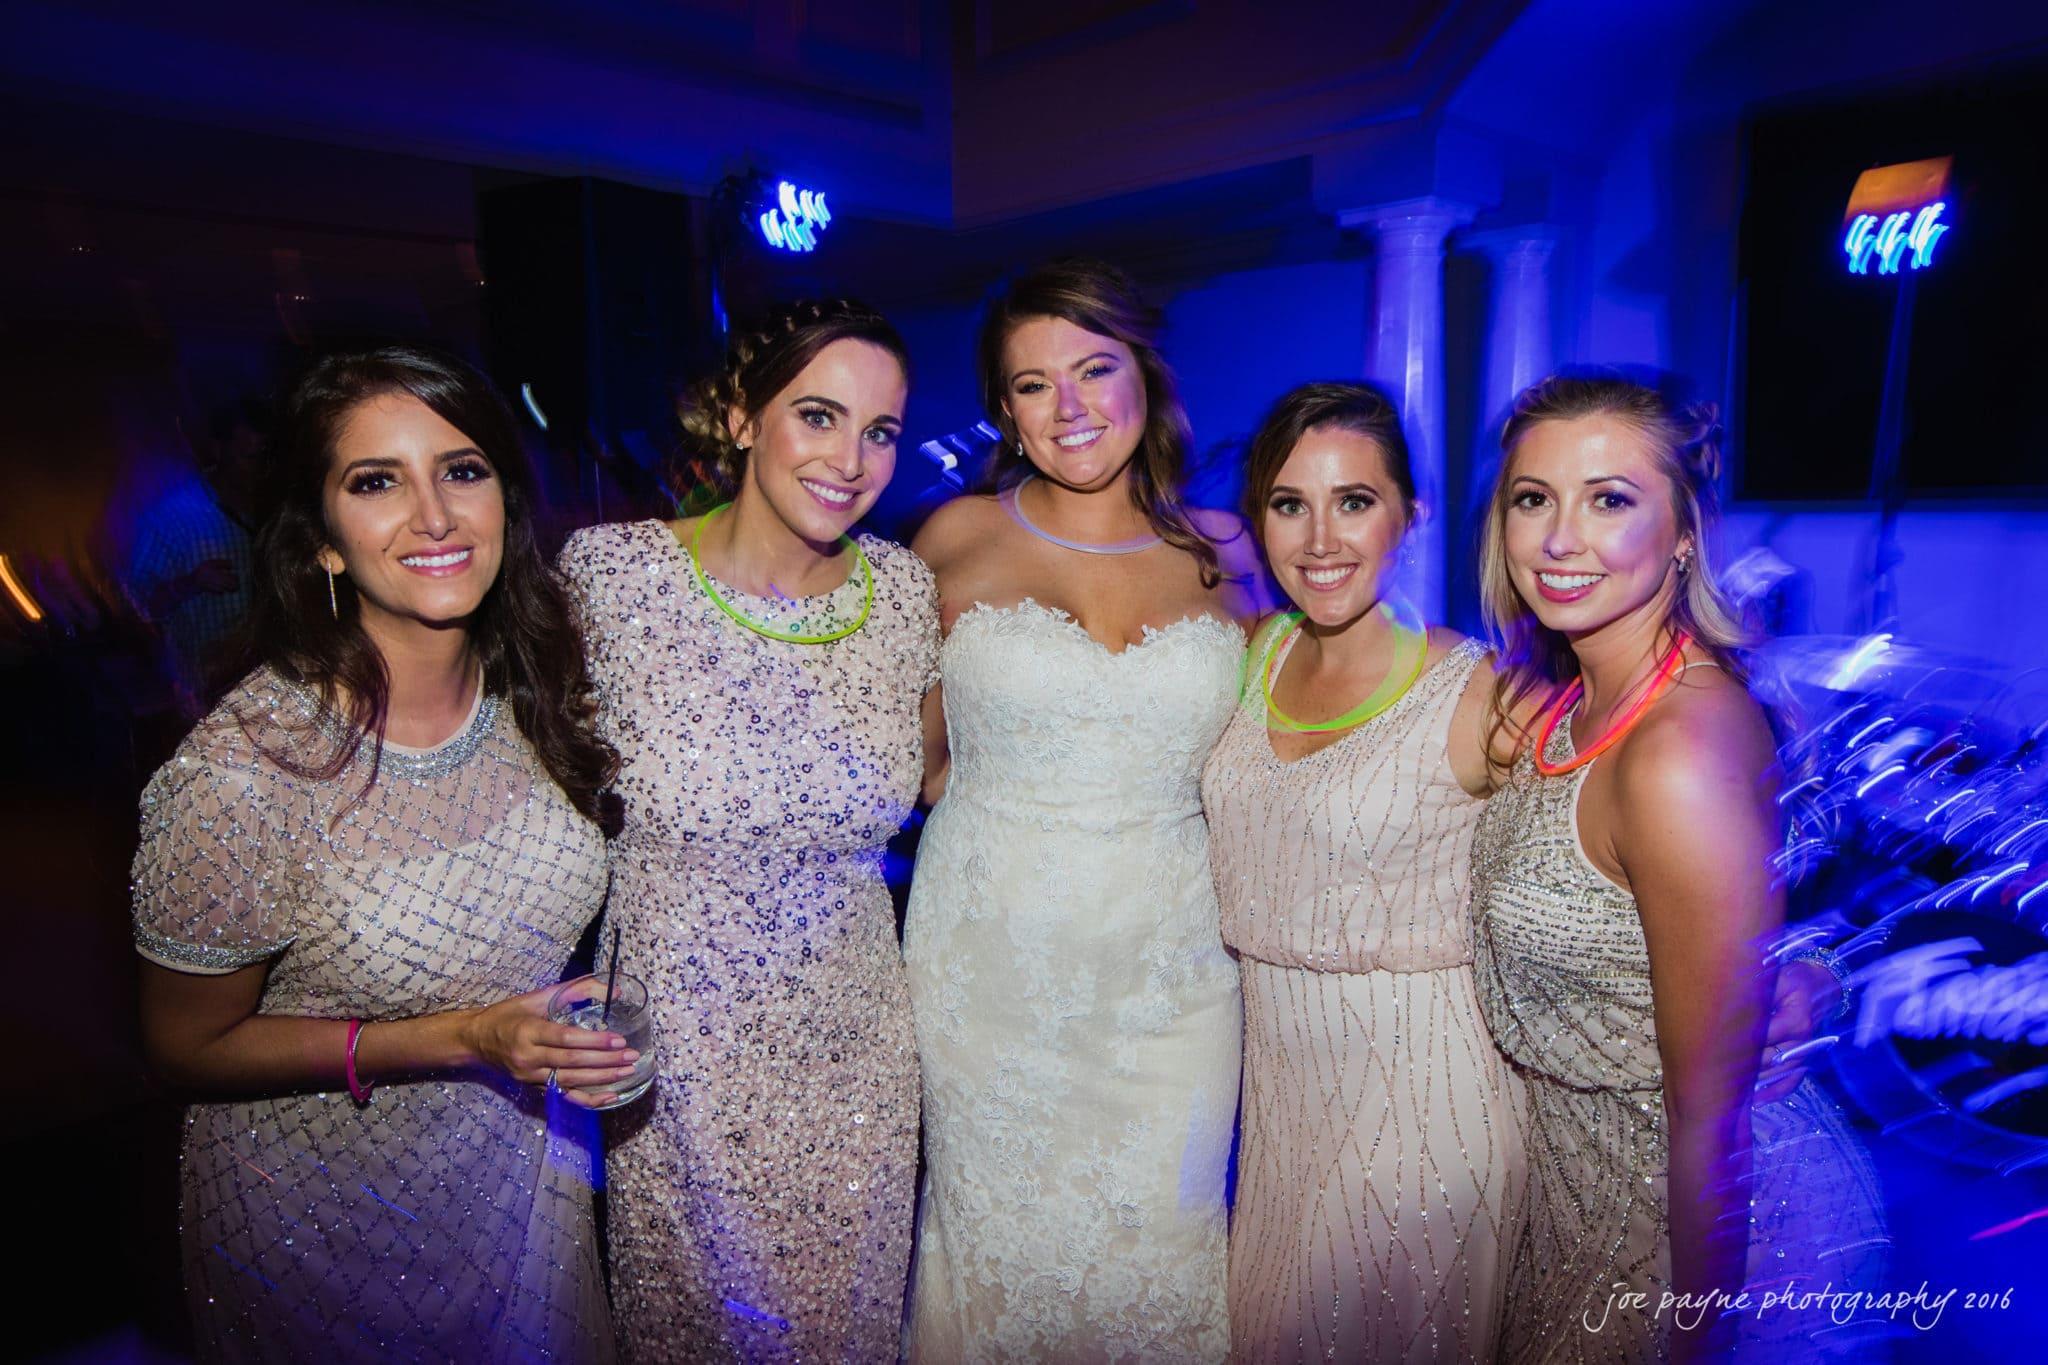 city-club-raleigh-wedding-photography-lauren-adam-69